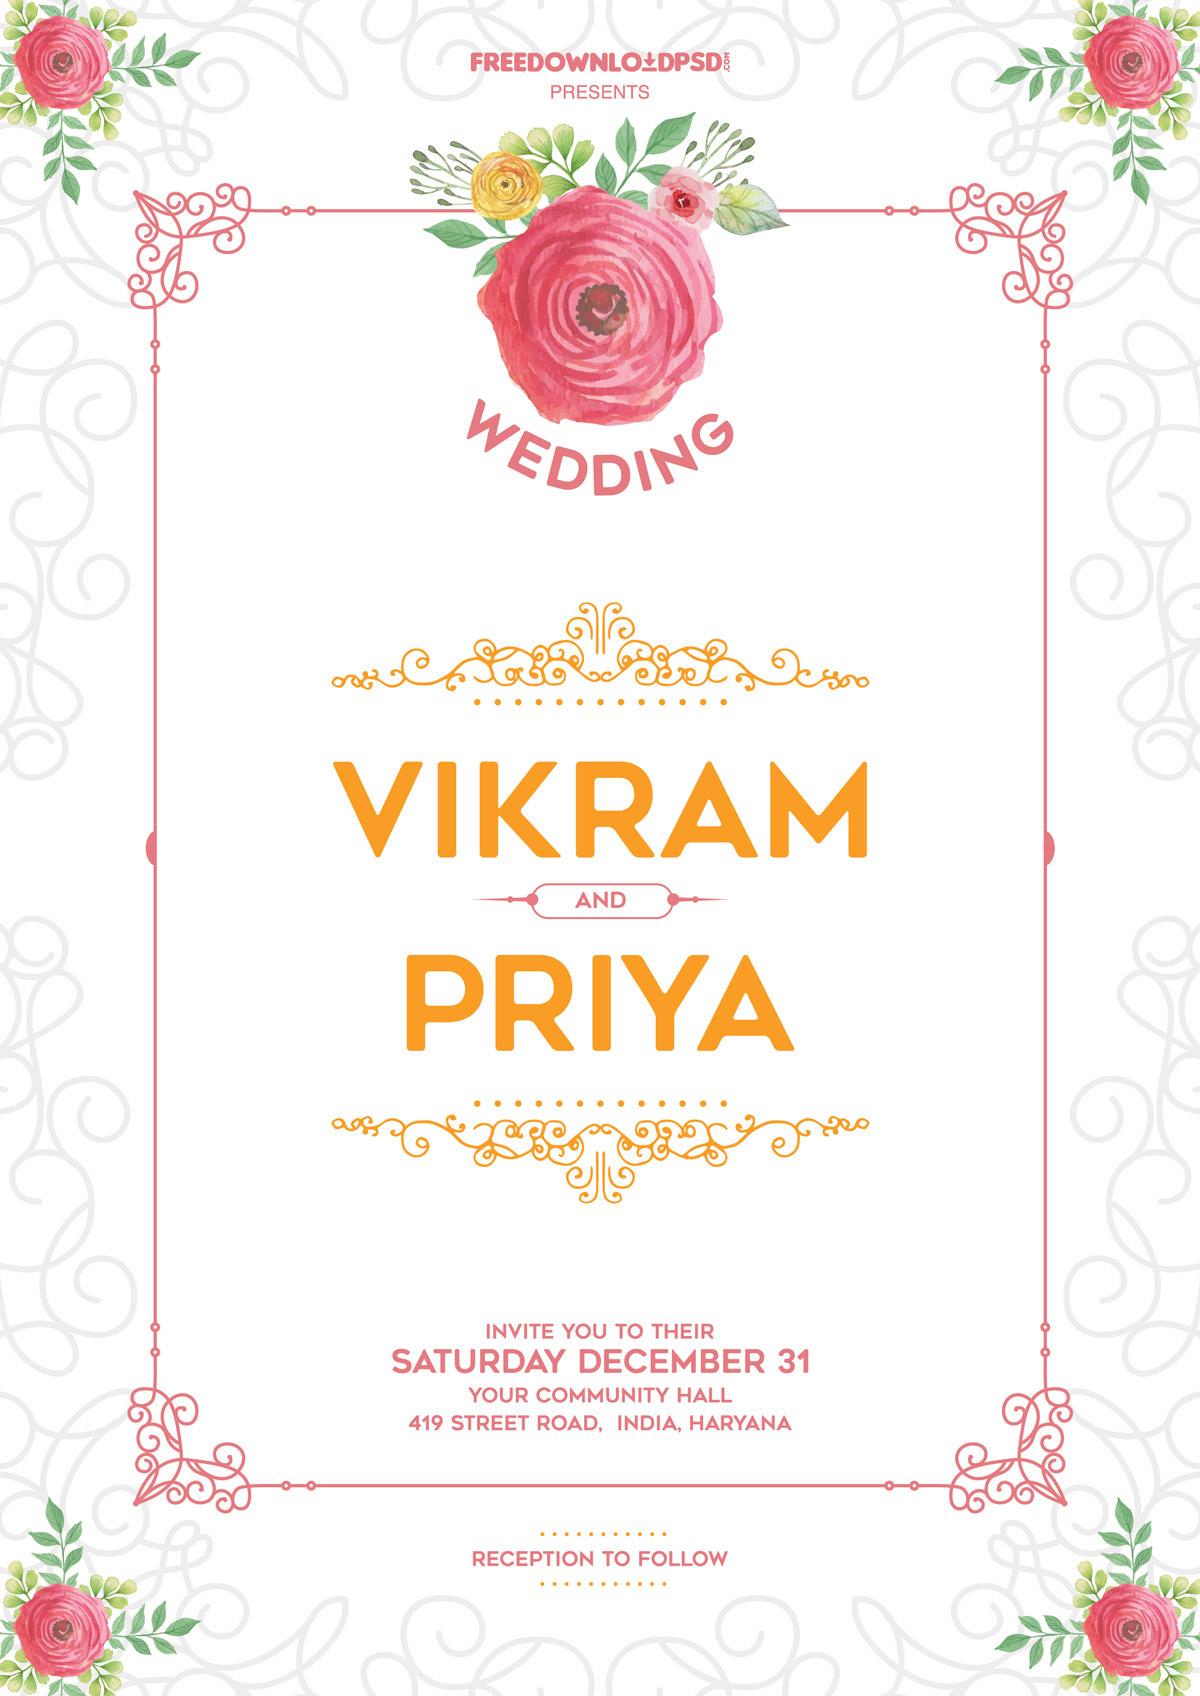 Free Wedding Fonts For Your Diy Invitations: 30+ Elegant Wedding Invitation PSD Templates